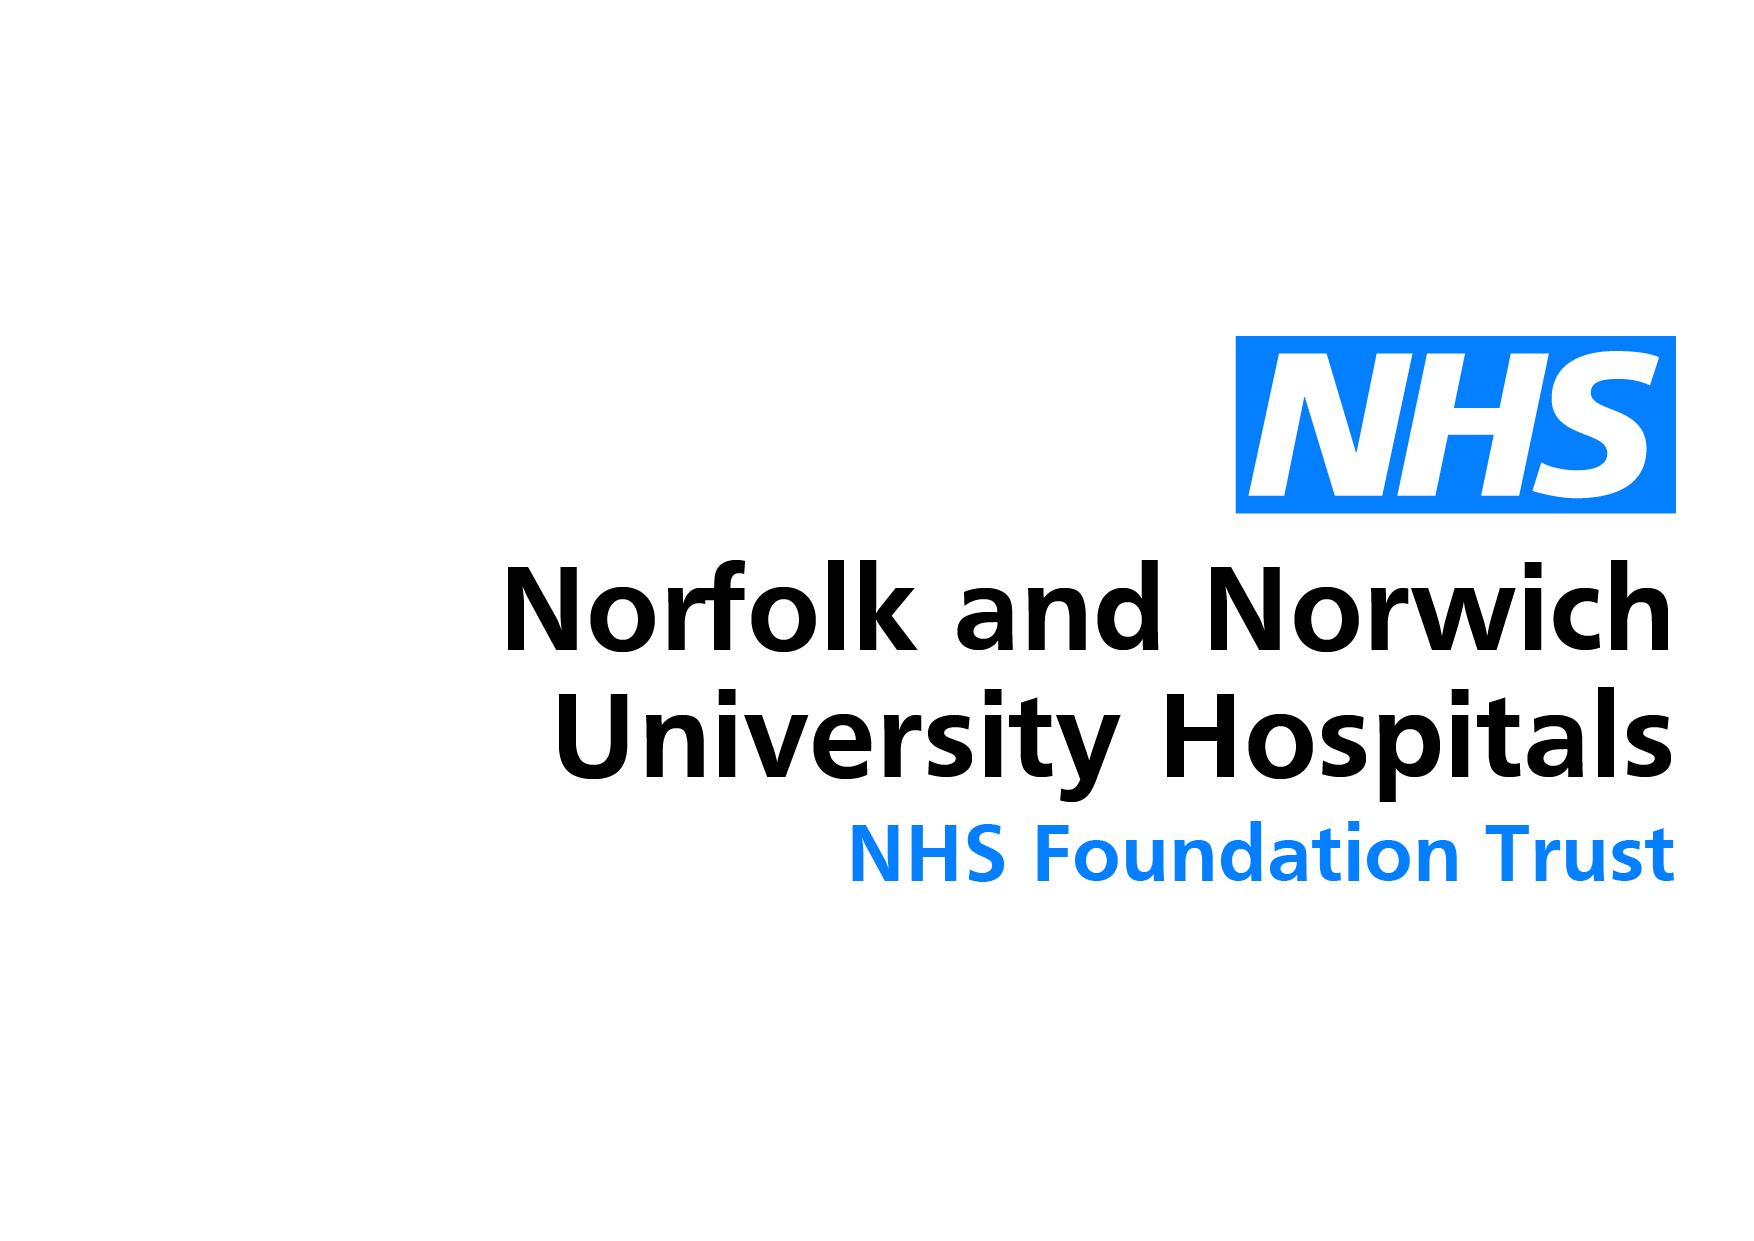 Norfolk and Norwich University Hospitals NHS Logo